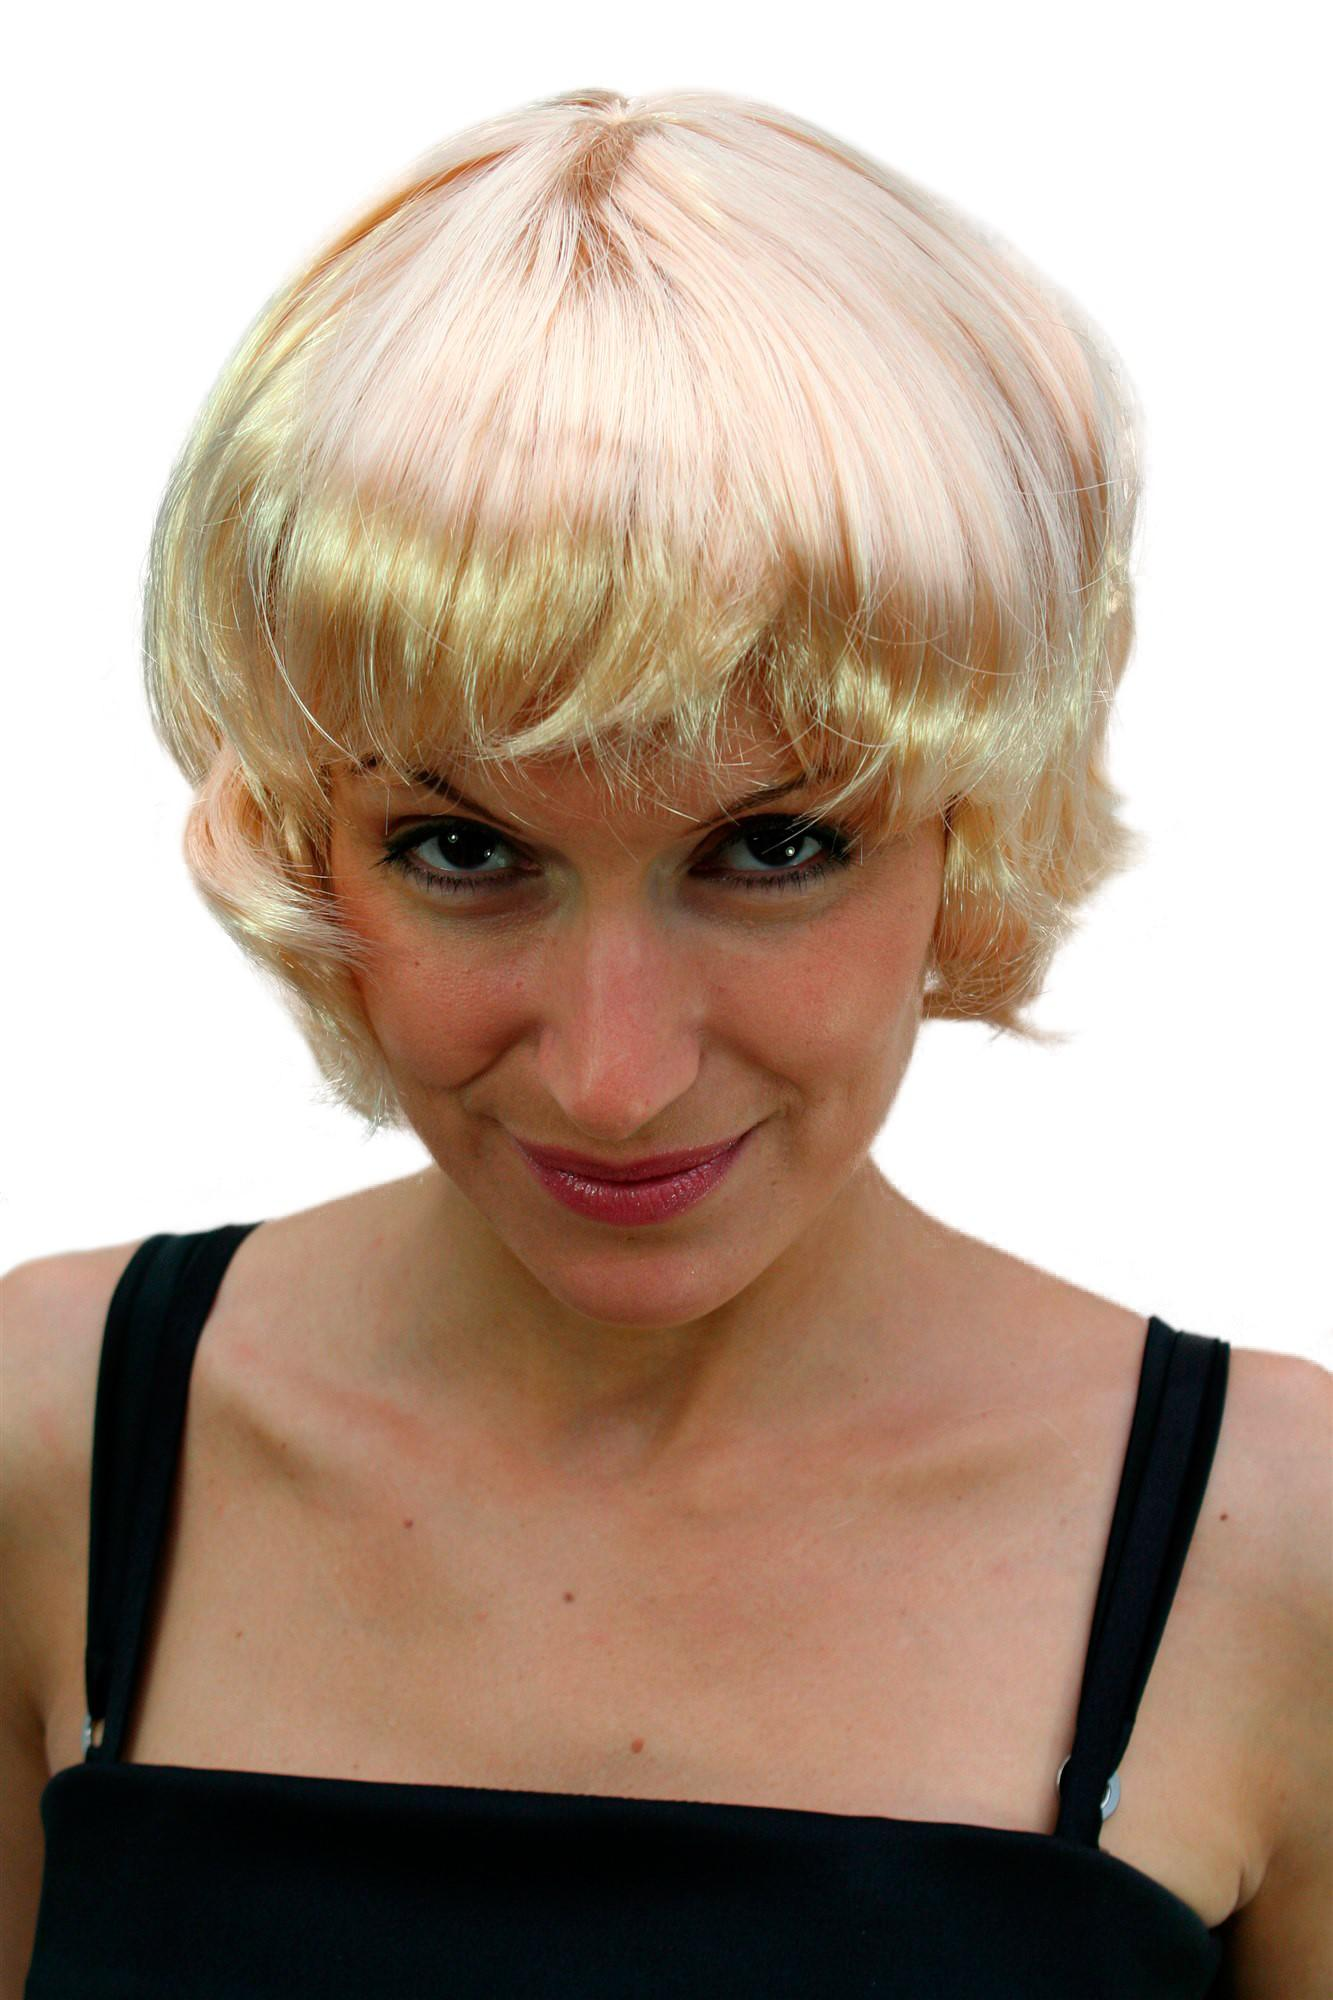 per cke blond kurz bob party wig perr cke neu ovp kaufen bei vk event fashion gmbh. Black Bedroom Furniture Sets. Home Design Ideas